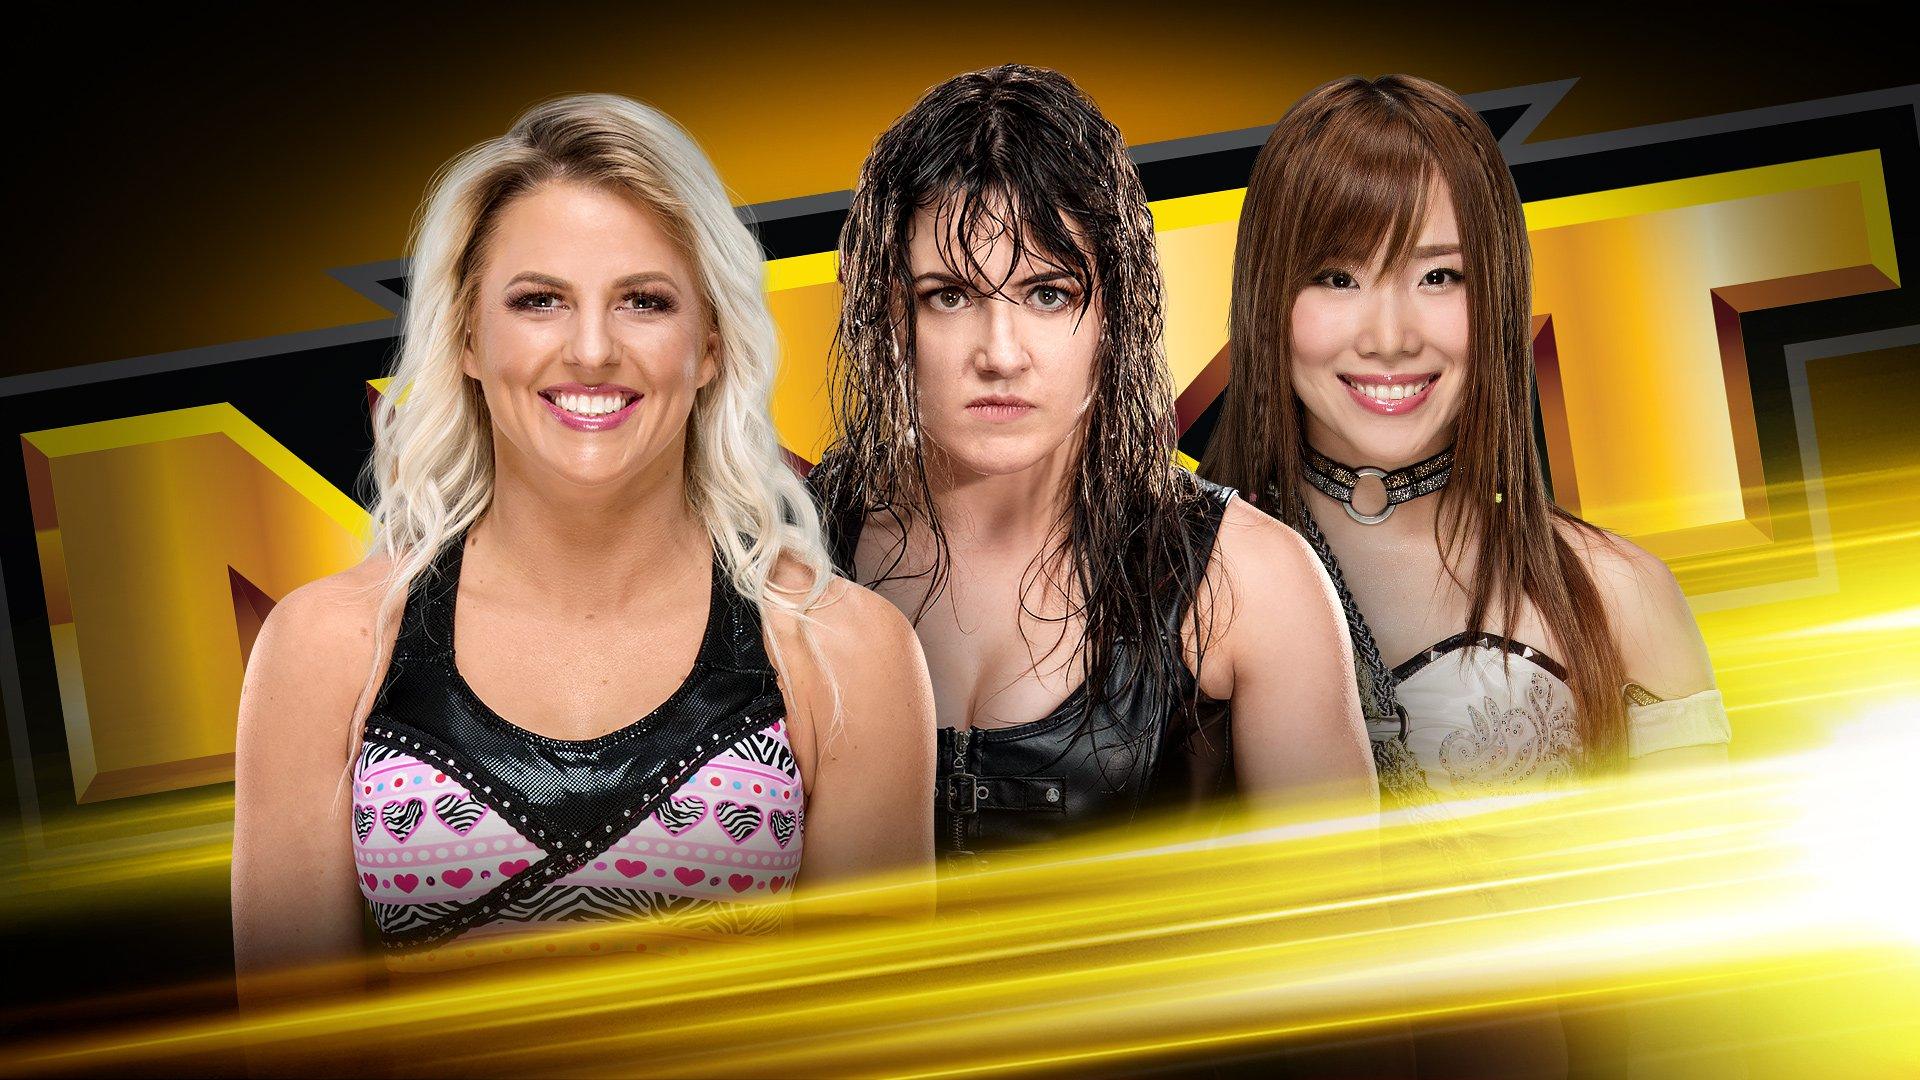 Triple Threat Match confirmada para o próximo WWE NXT